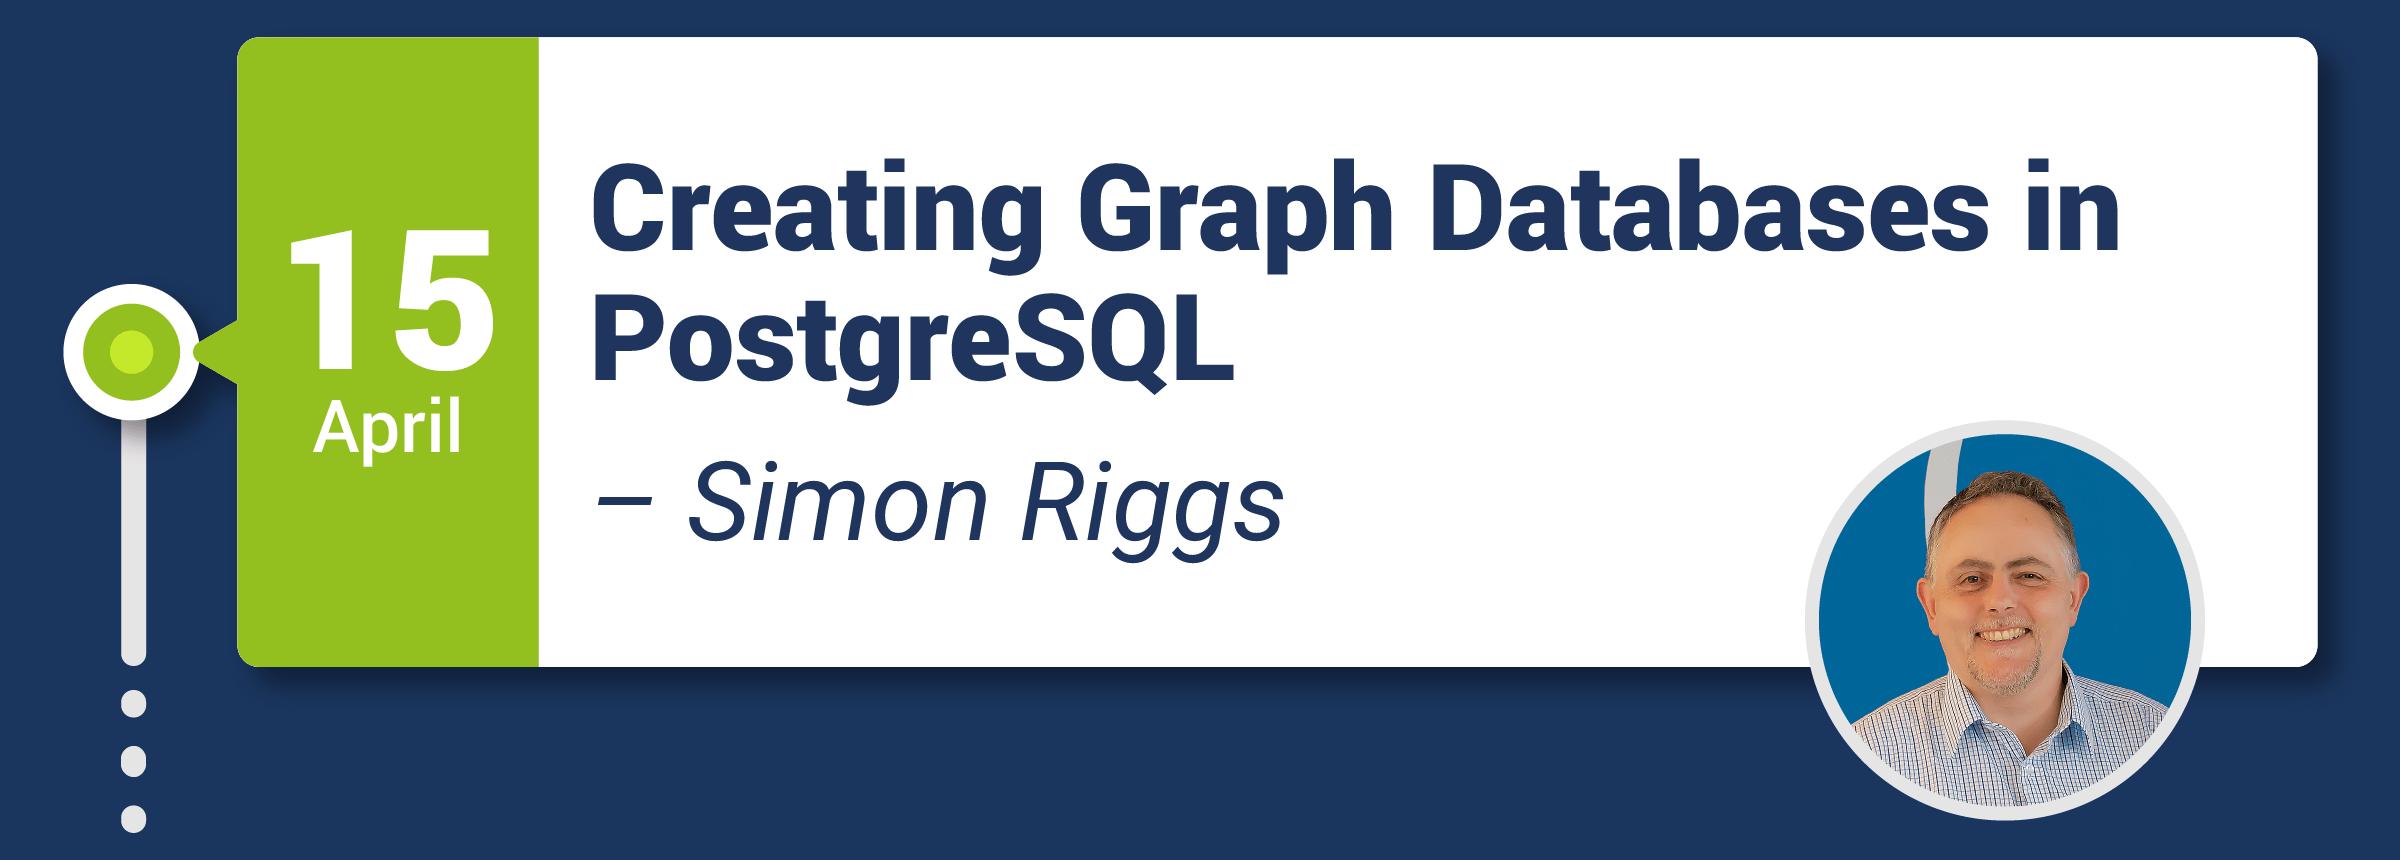 Webinar: Creating Graph Databases in PostgreSQL